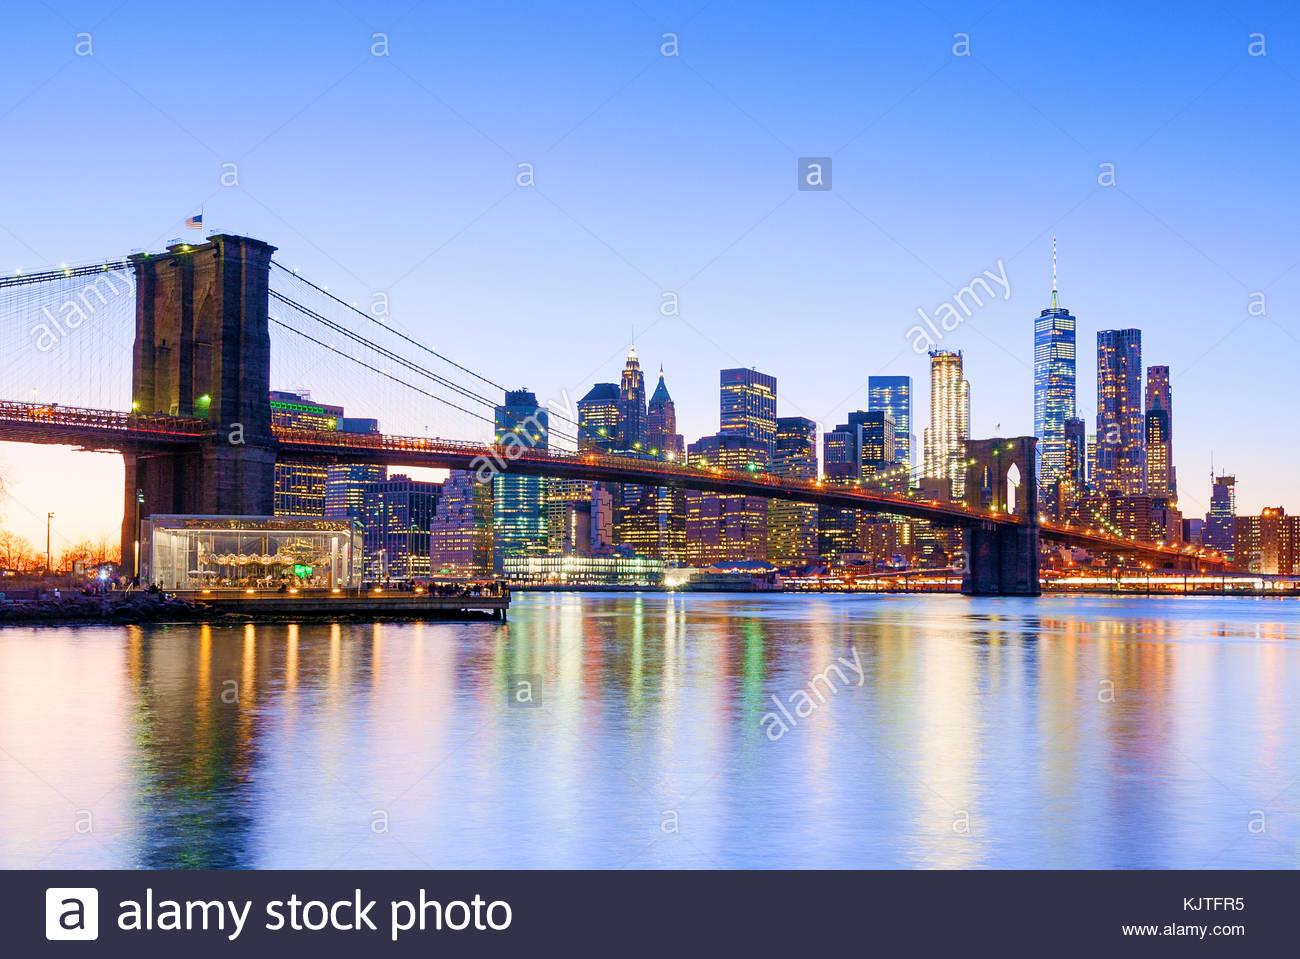 New York Skyline New York City Brooklyn Bridge One WTC World Trade Center Stockbild